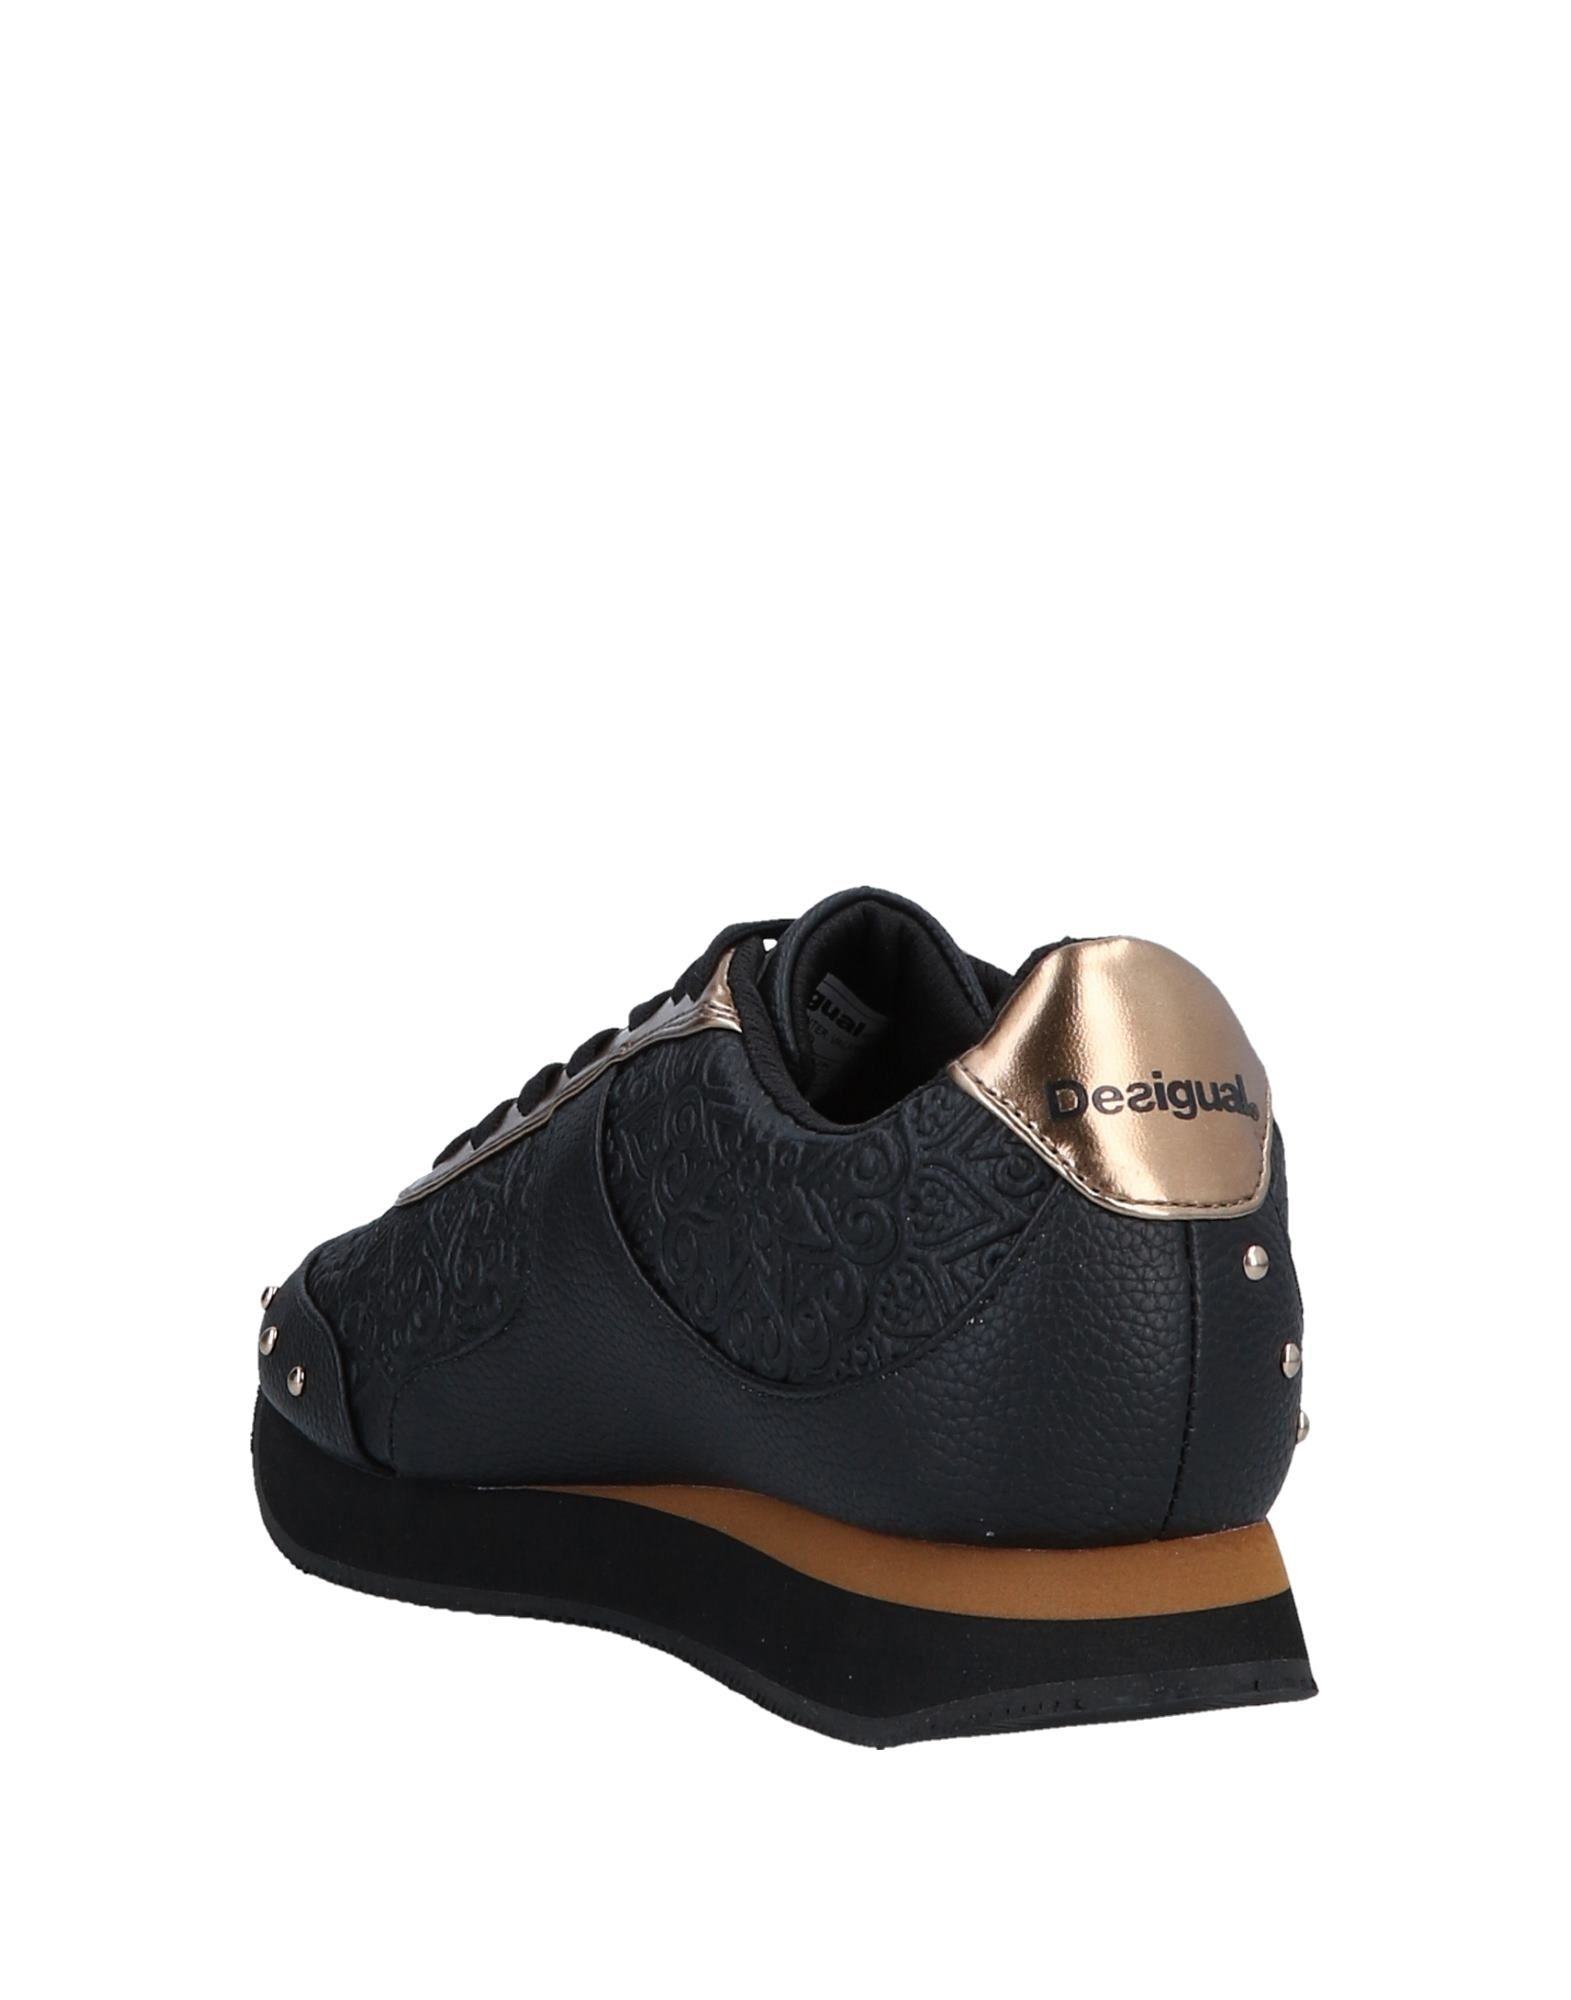 Desigual Gute Sneakers Damen  11574099EP Gute Desigual Qualität beliebte Schuhe 67adbf